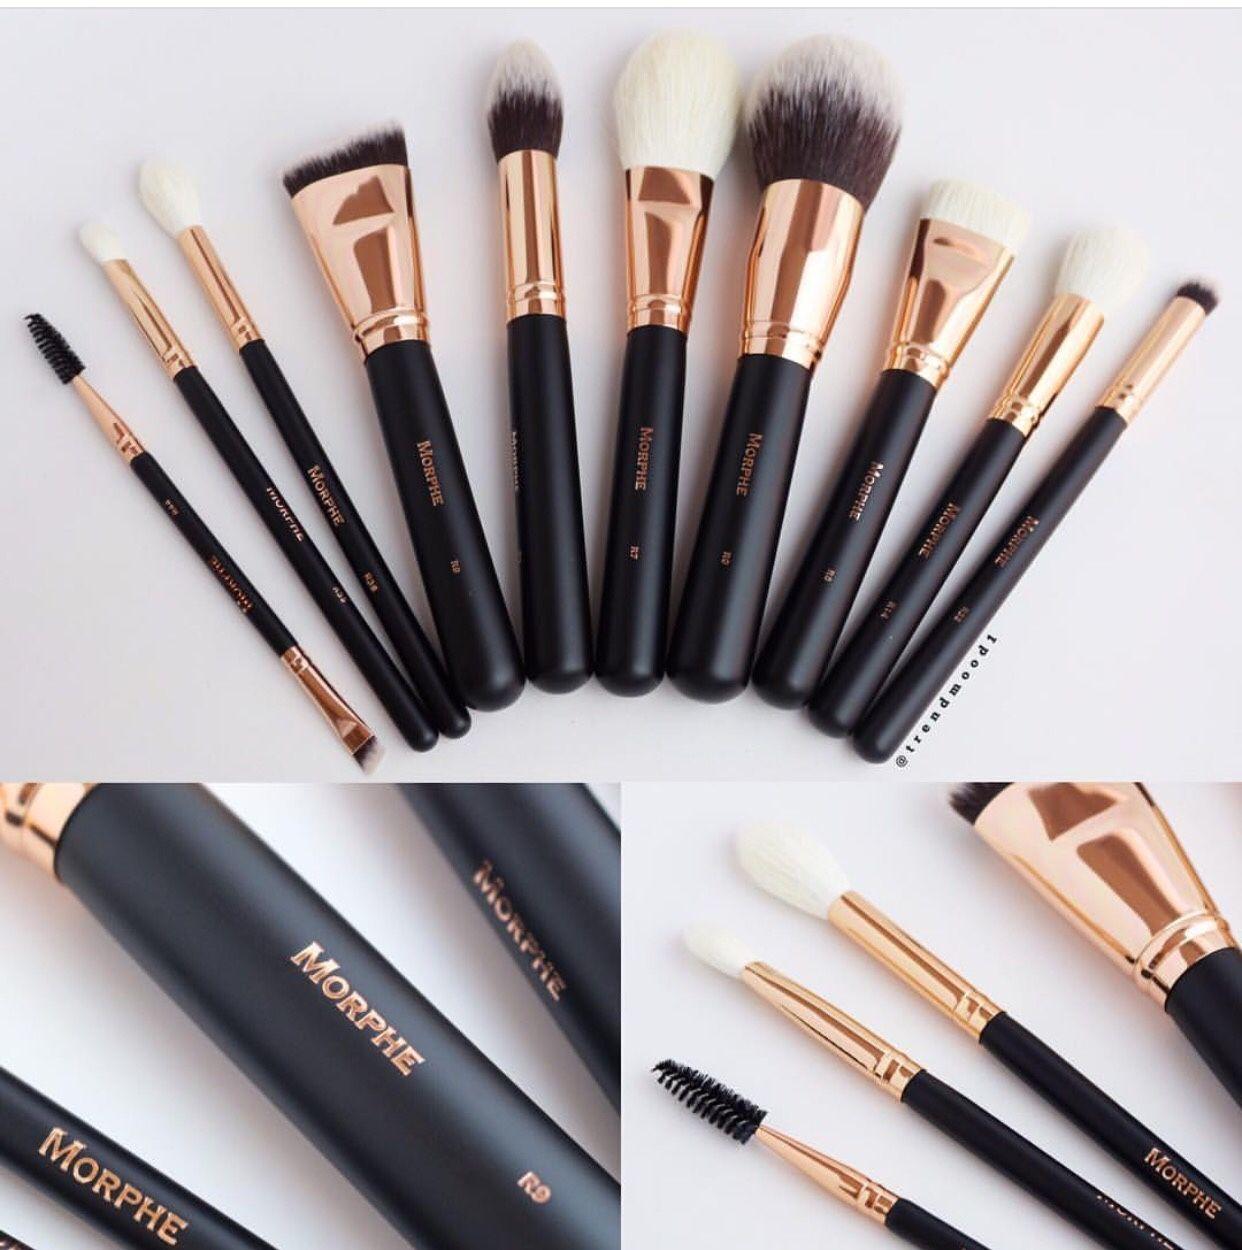 Image result for MORPHE Brush Makeup Set 12pcs